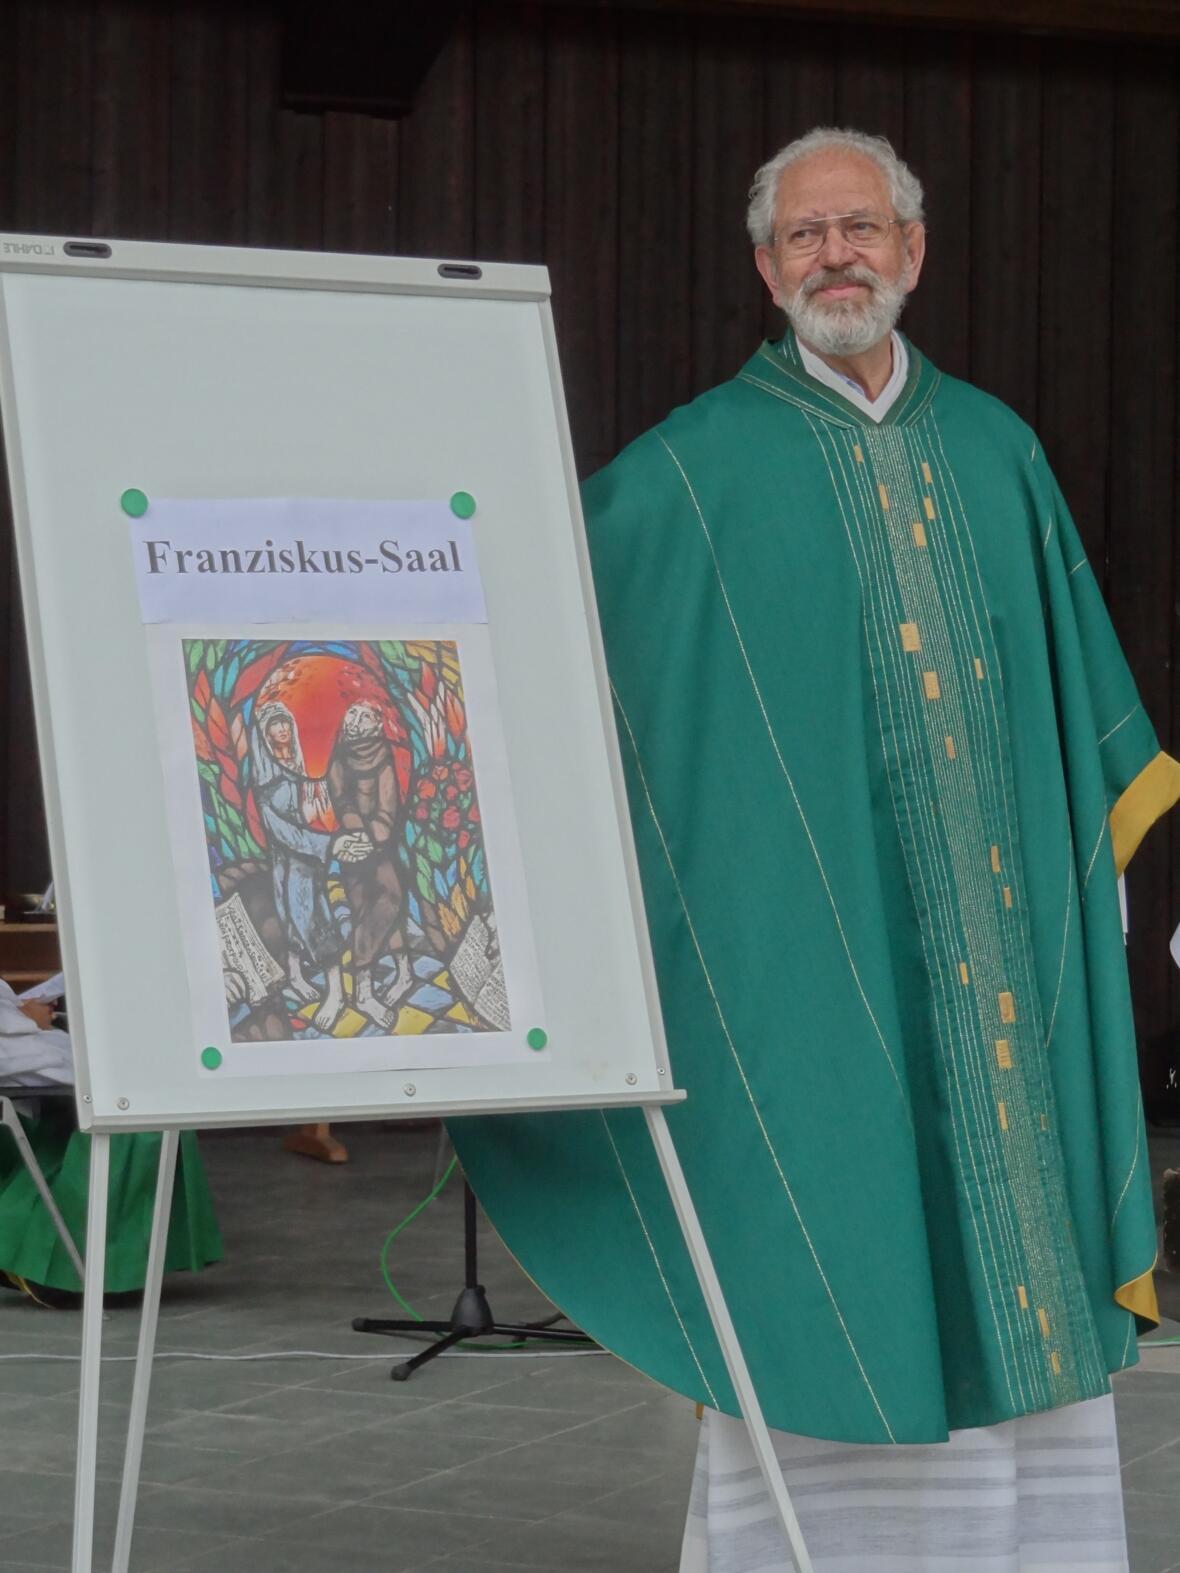 Franziskus-Saal